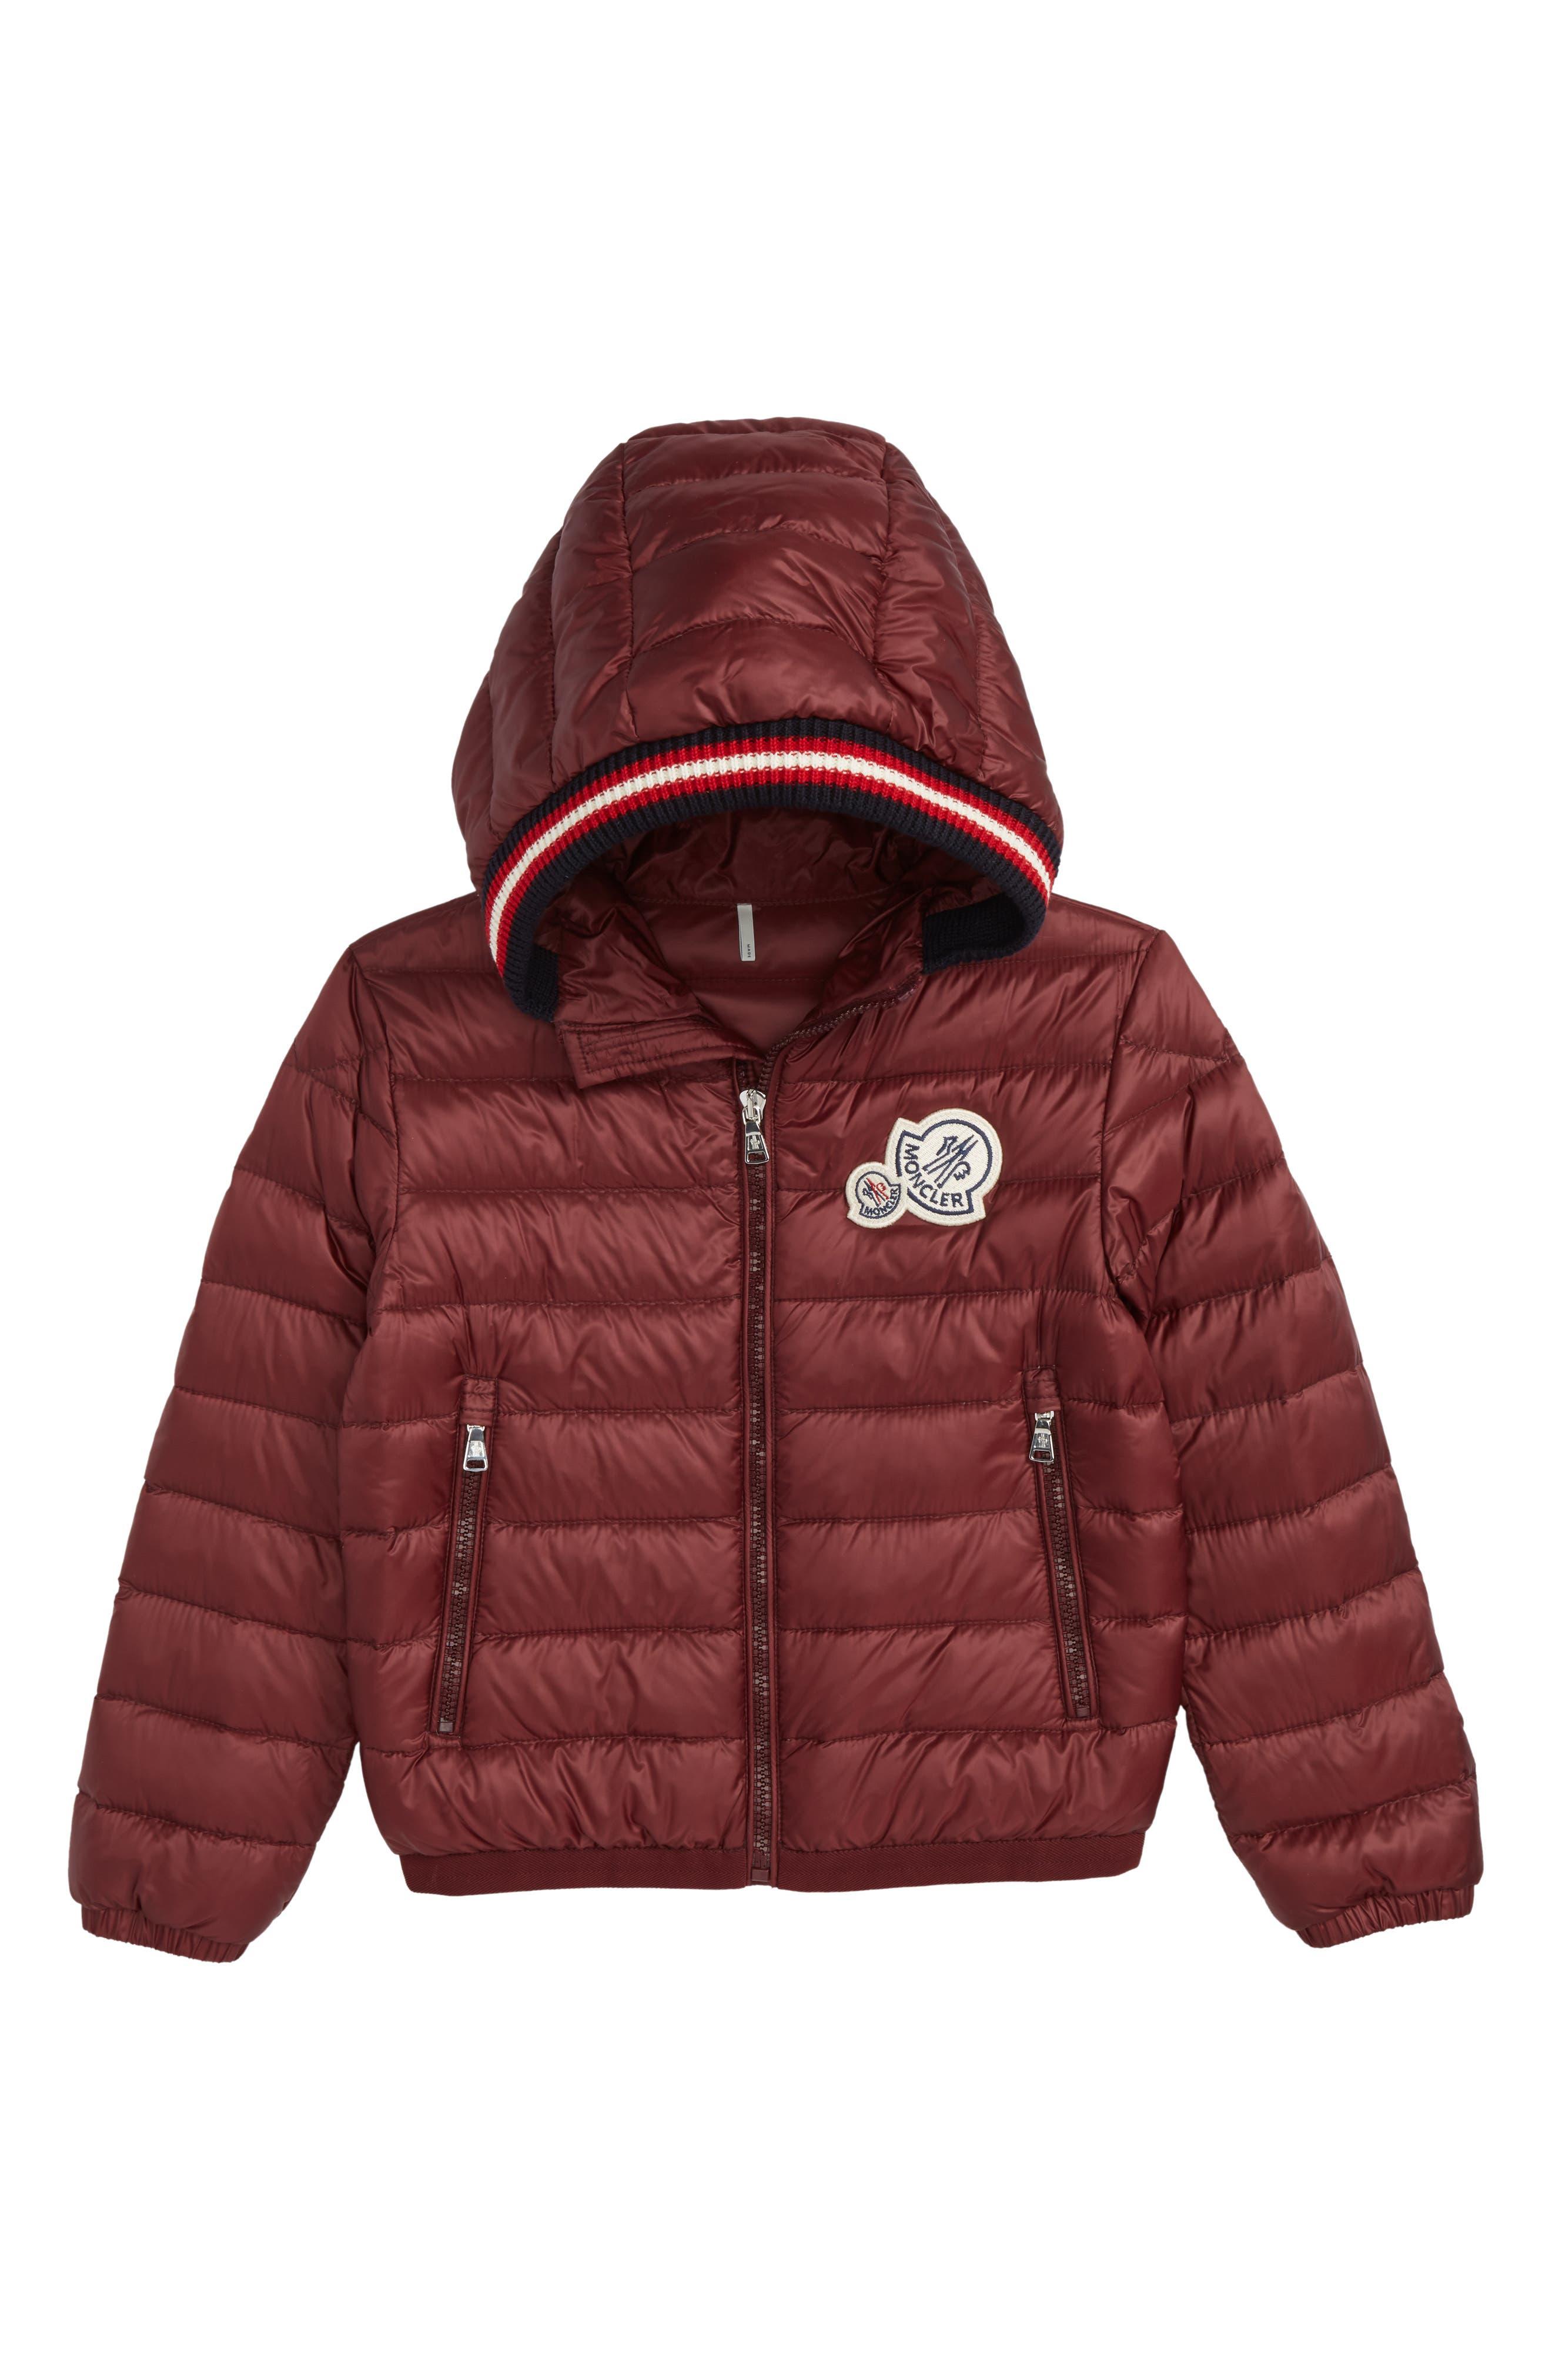 Xavier Long Season Hooded Down Jacket,                         Main,                         color, Dark Red